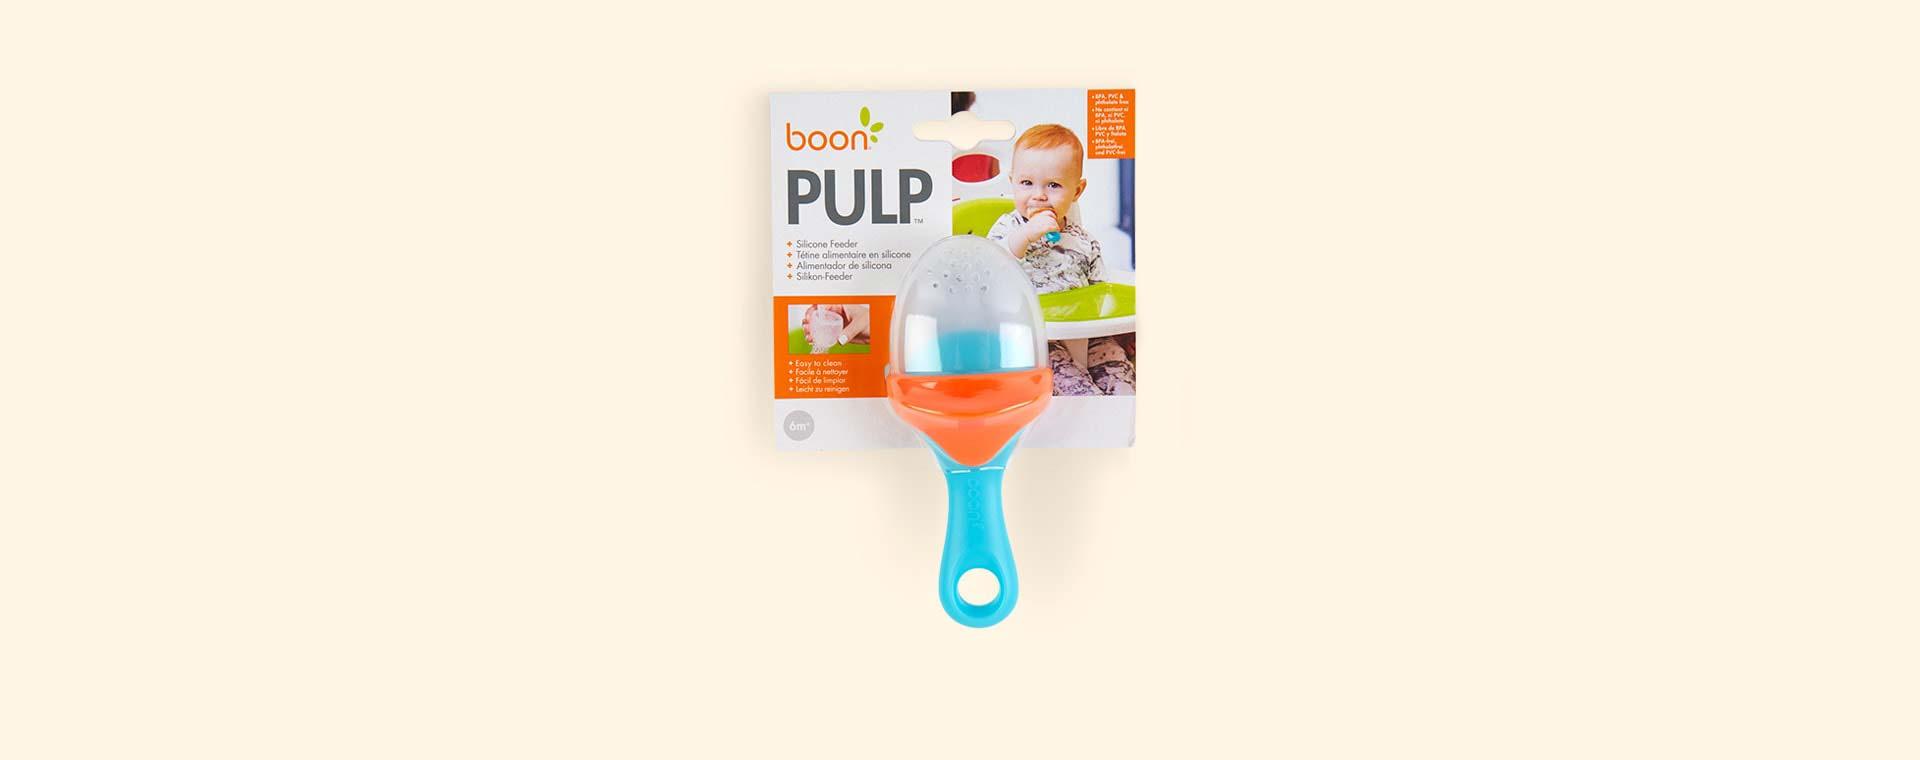 Blue Boon Pulp Silicone Feeder